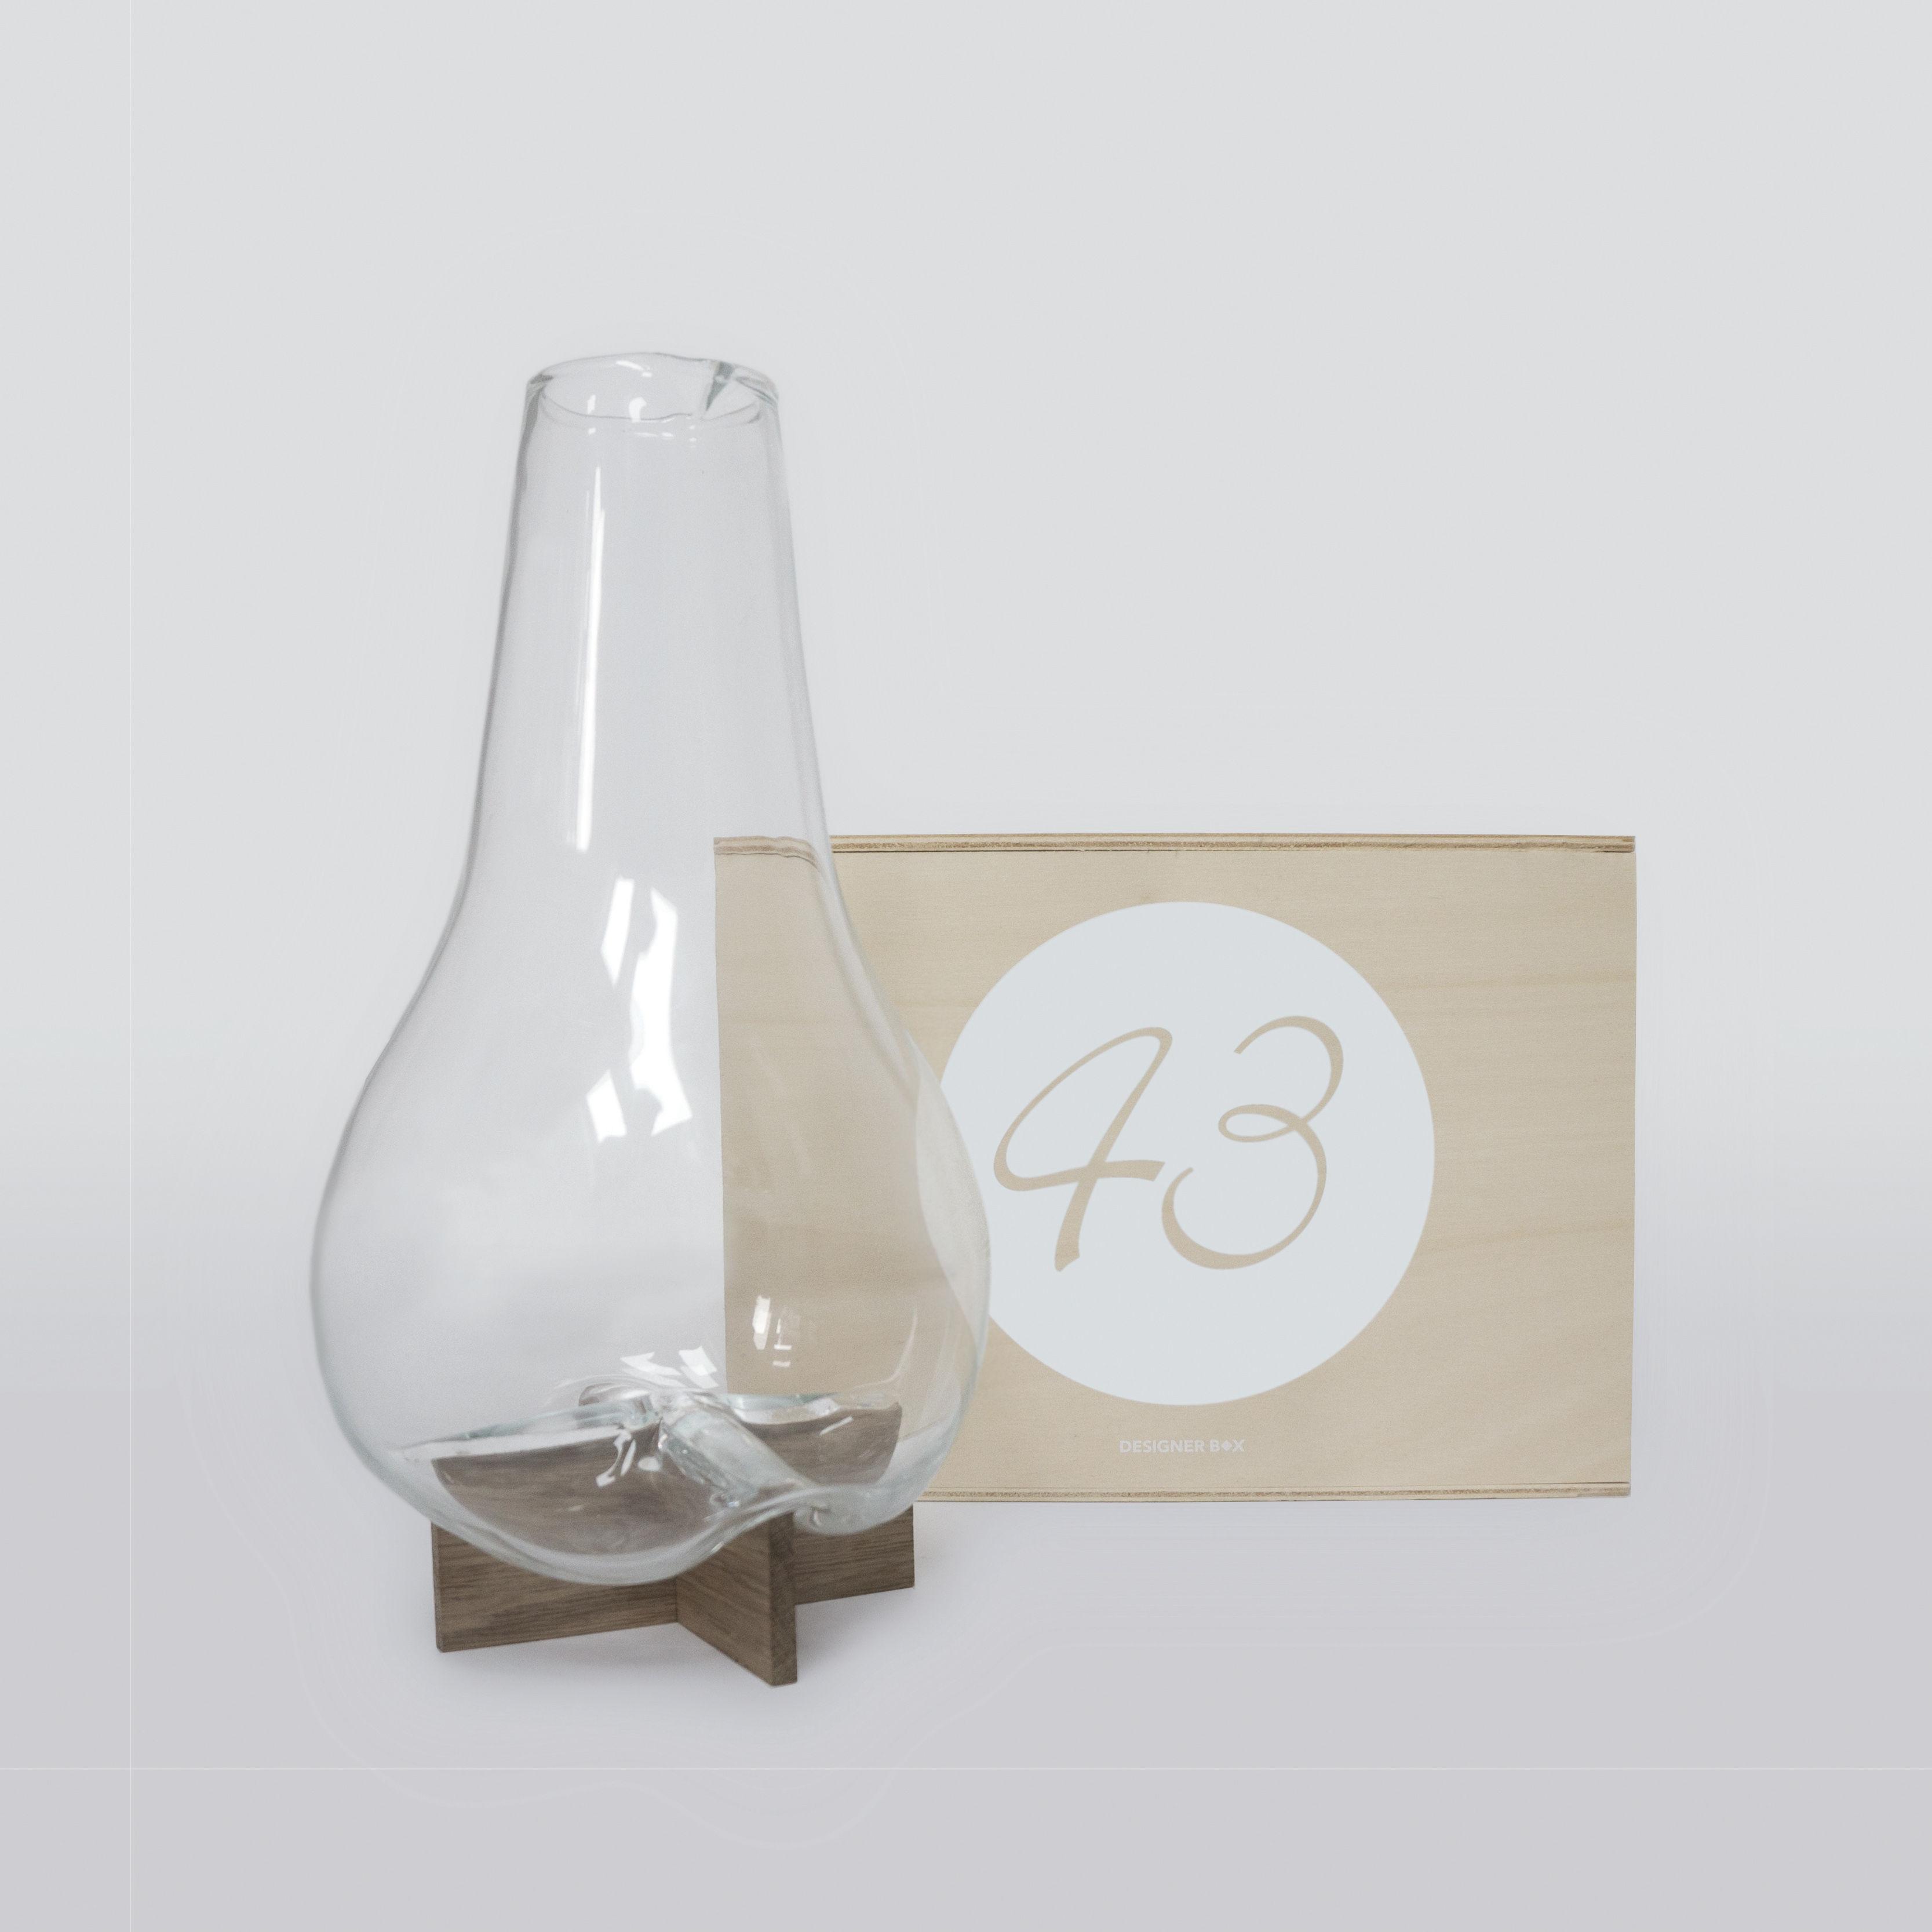 Tableware - Water Carafes & Wine Decanters - Designerbox#43 Box - Carafe / Vanessa Mitrani by Designerbox - Transparent / Wood - Blown glass, Solid oak